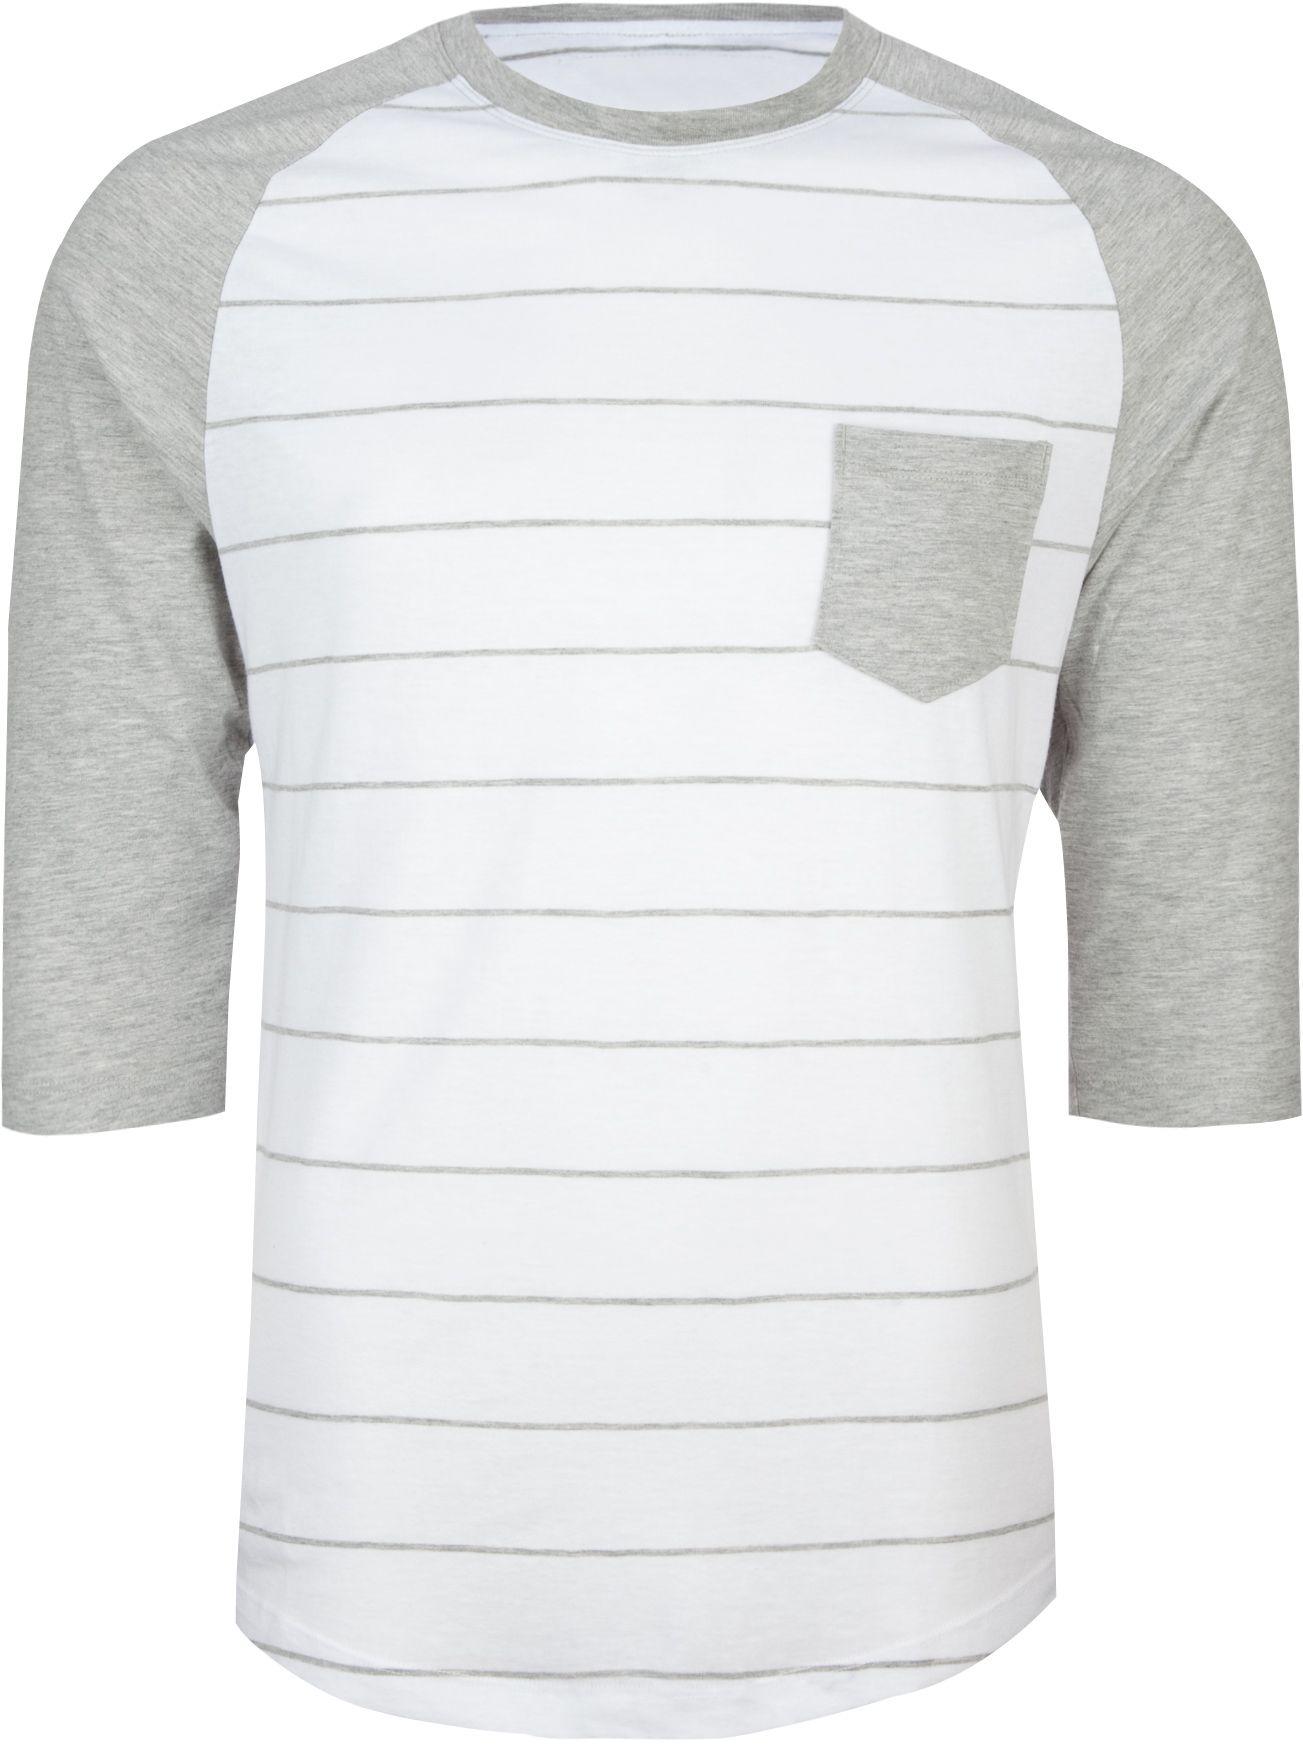 RETROFIT Stripe Raglan Mens Baseball Tee 201601210  7a151c10ed9